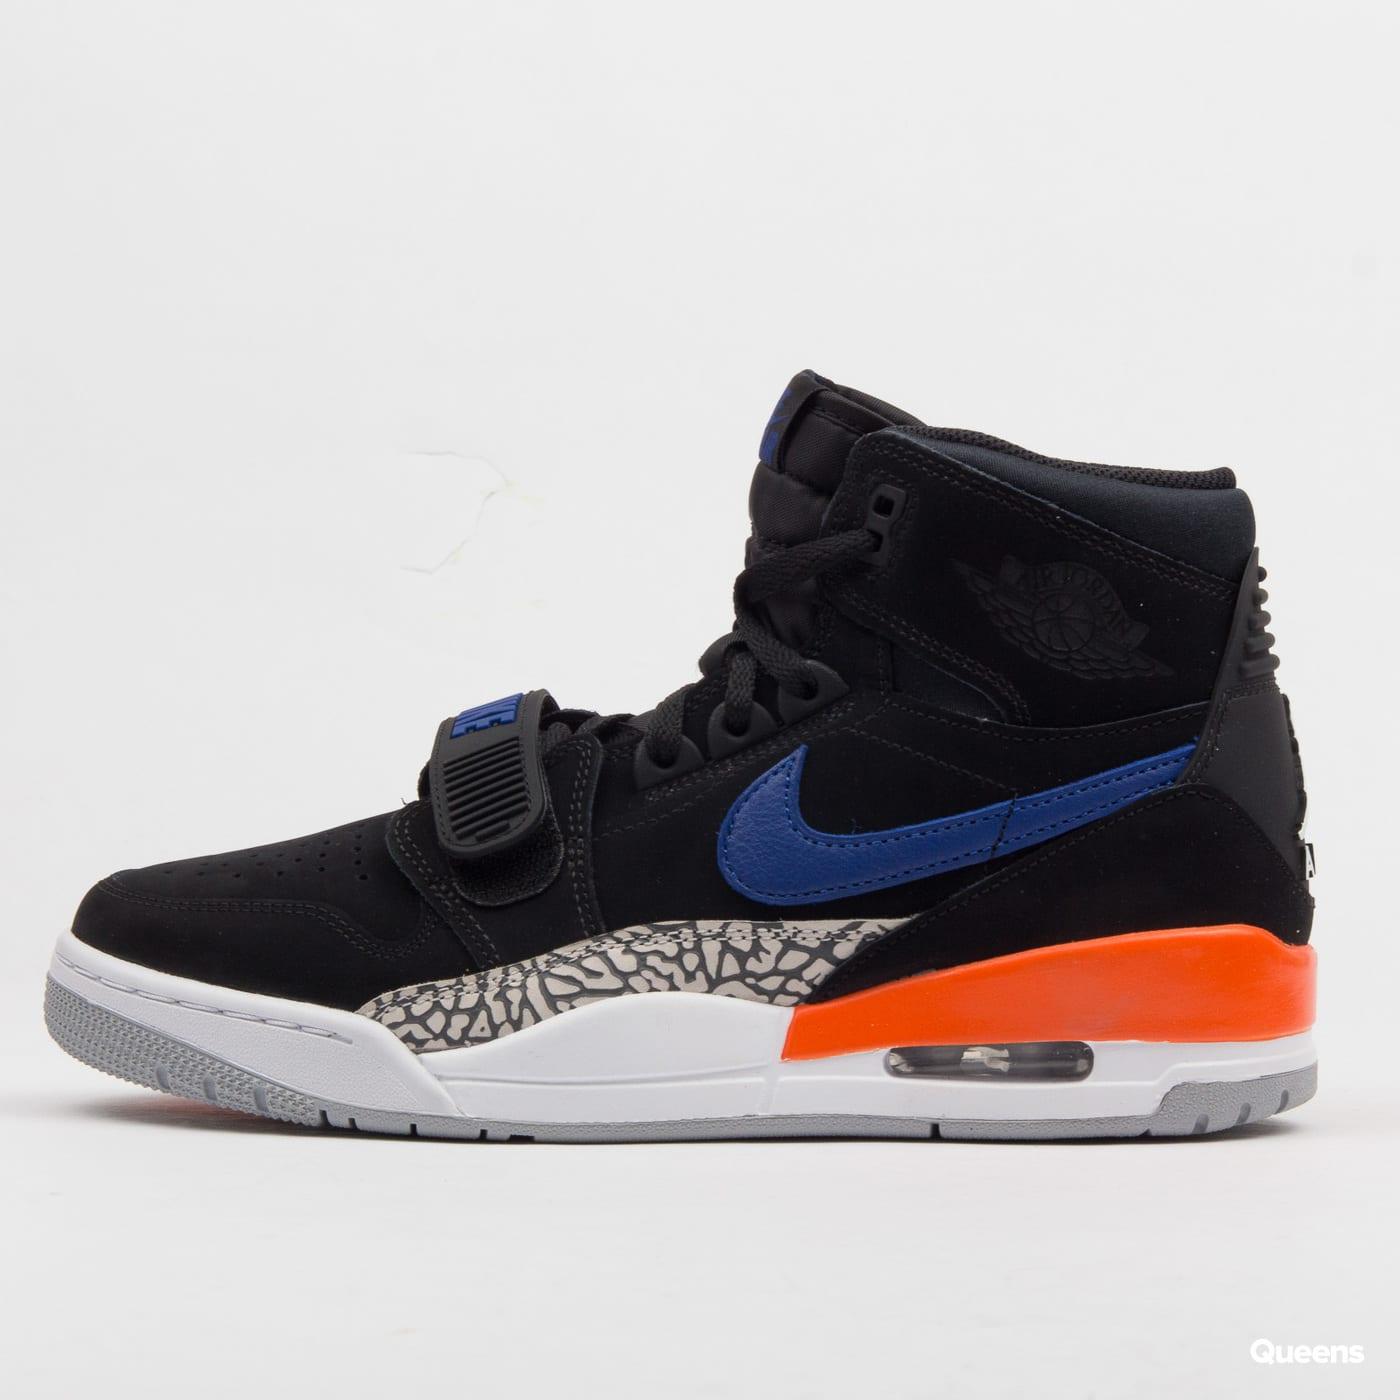 sports shoes a1e44 e761f Hineinzoomen Hineinzoomen Hineinzoomen Hineinzoomen Hineinzoomen. Jordan  Air Jordan Legacy 312 ...